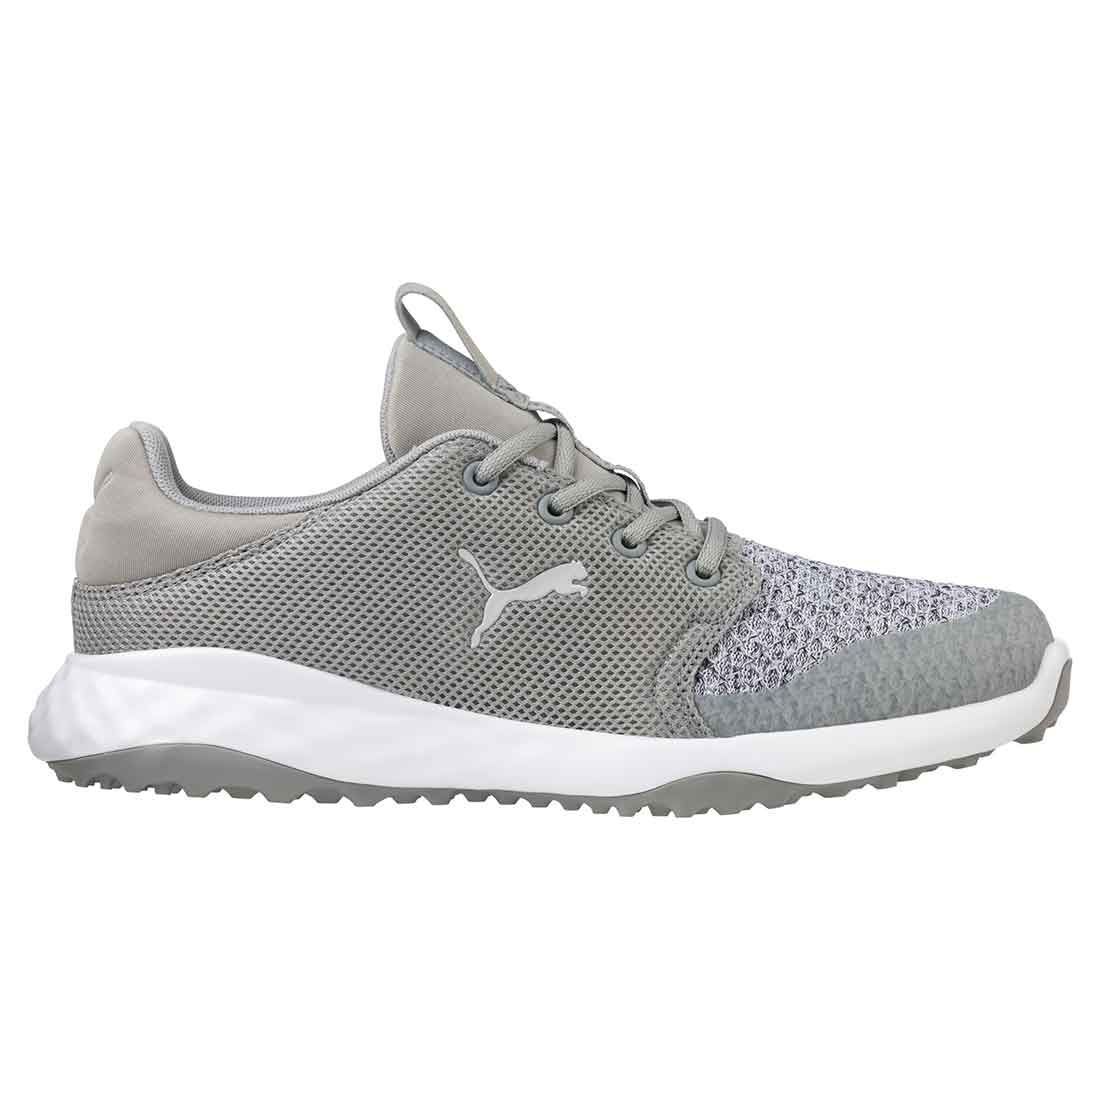 Buy Puma Grip Fusion Sport Golf Shoes